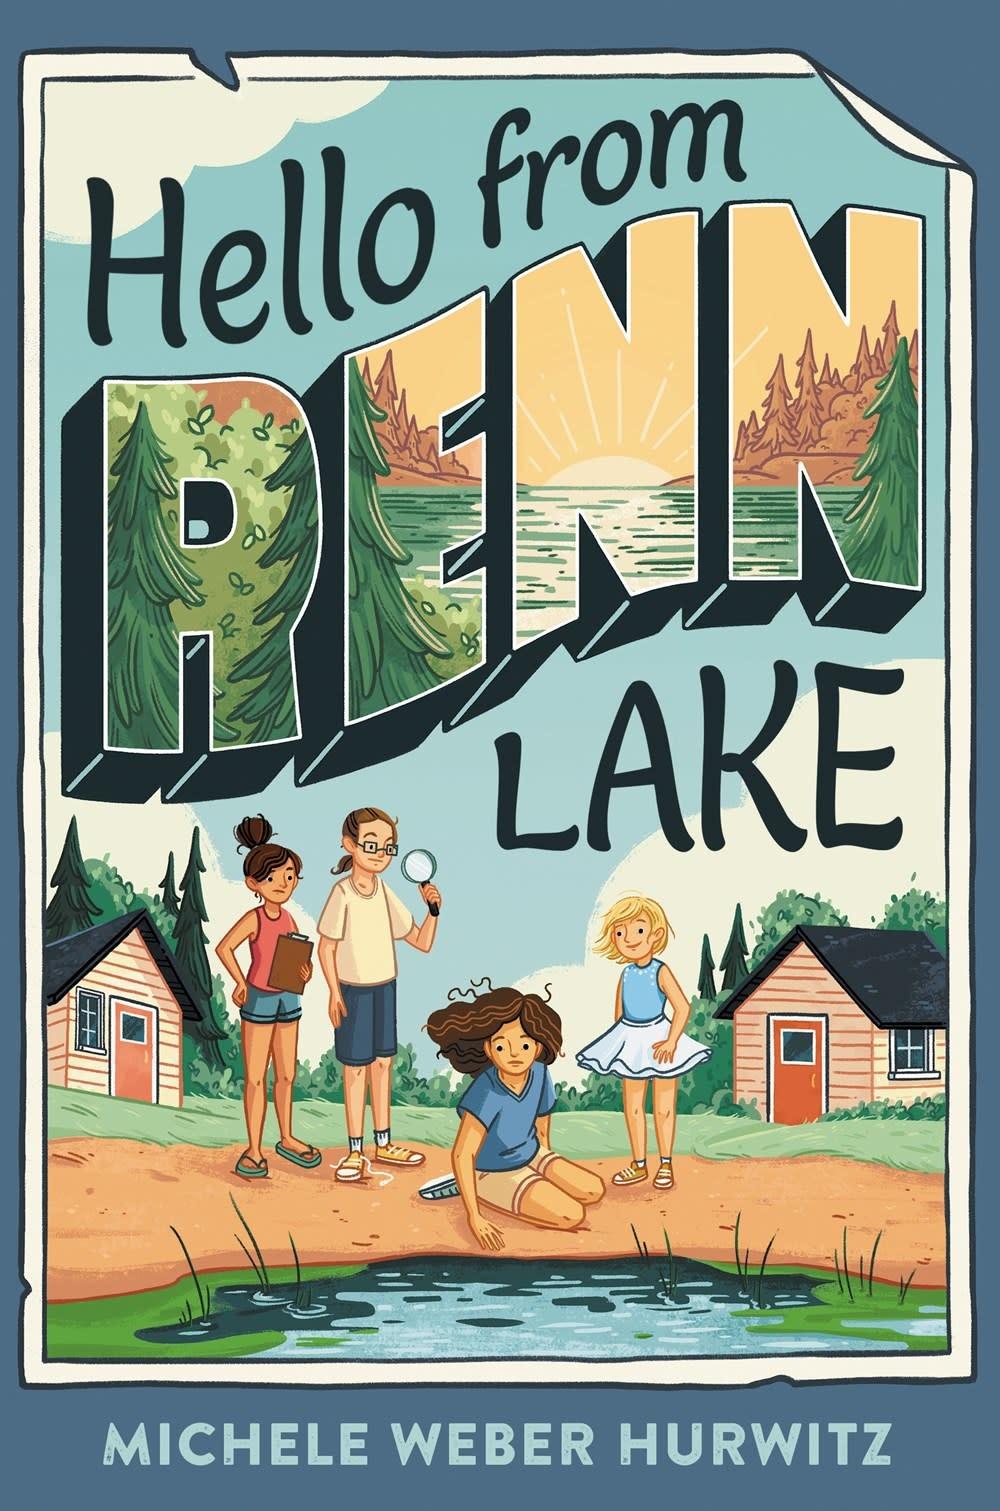 Wendy Lamb Books Hello from Renn Lake